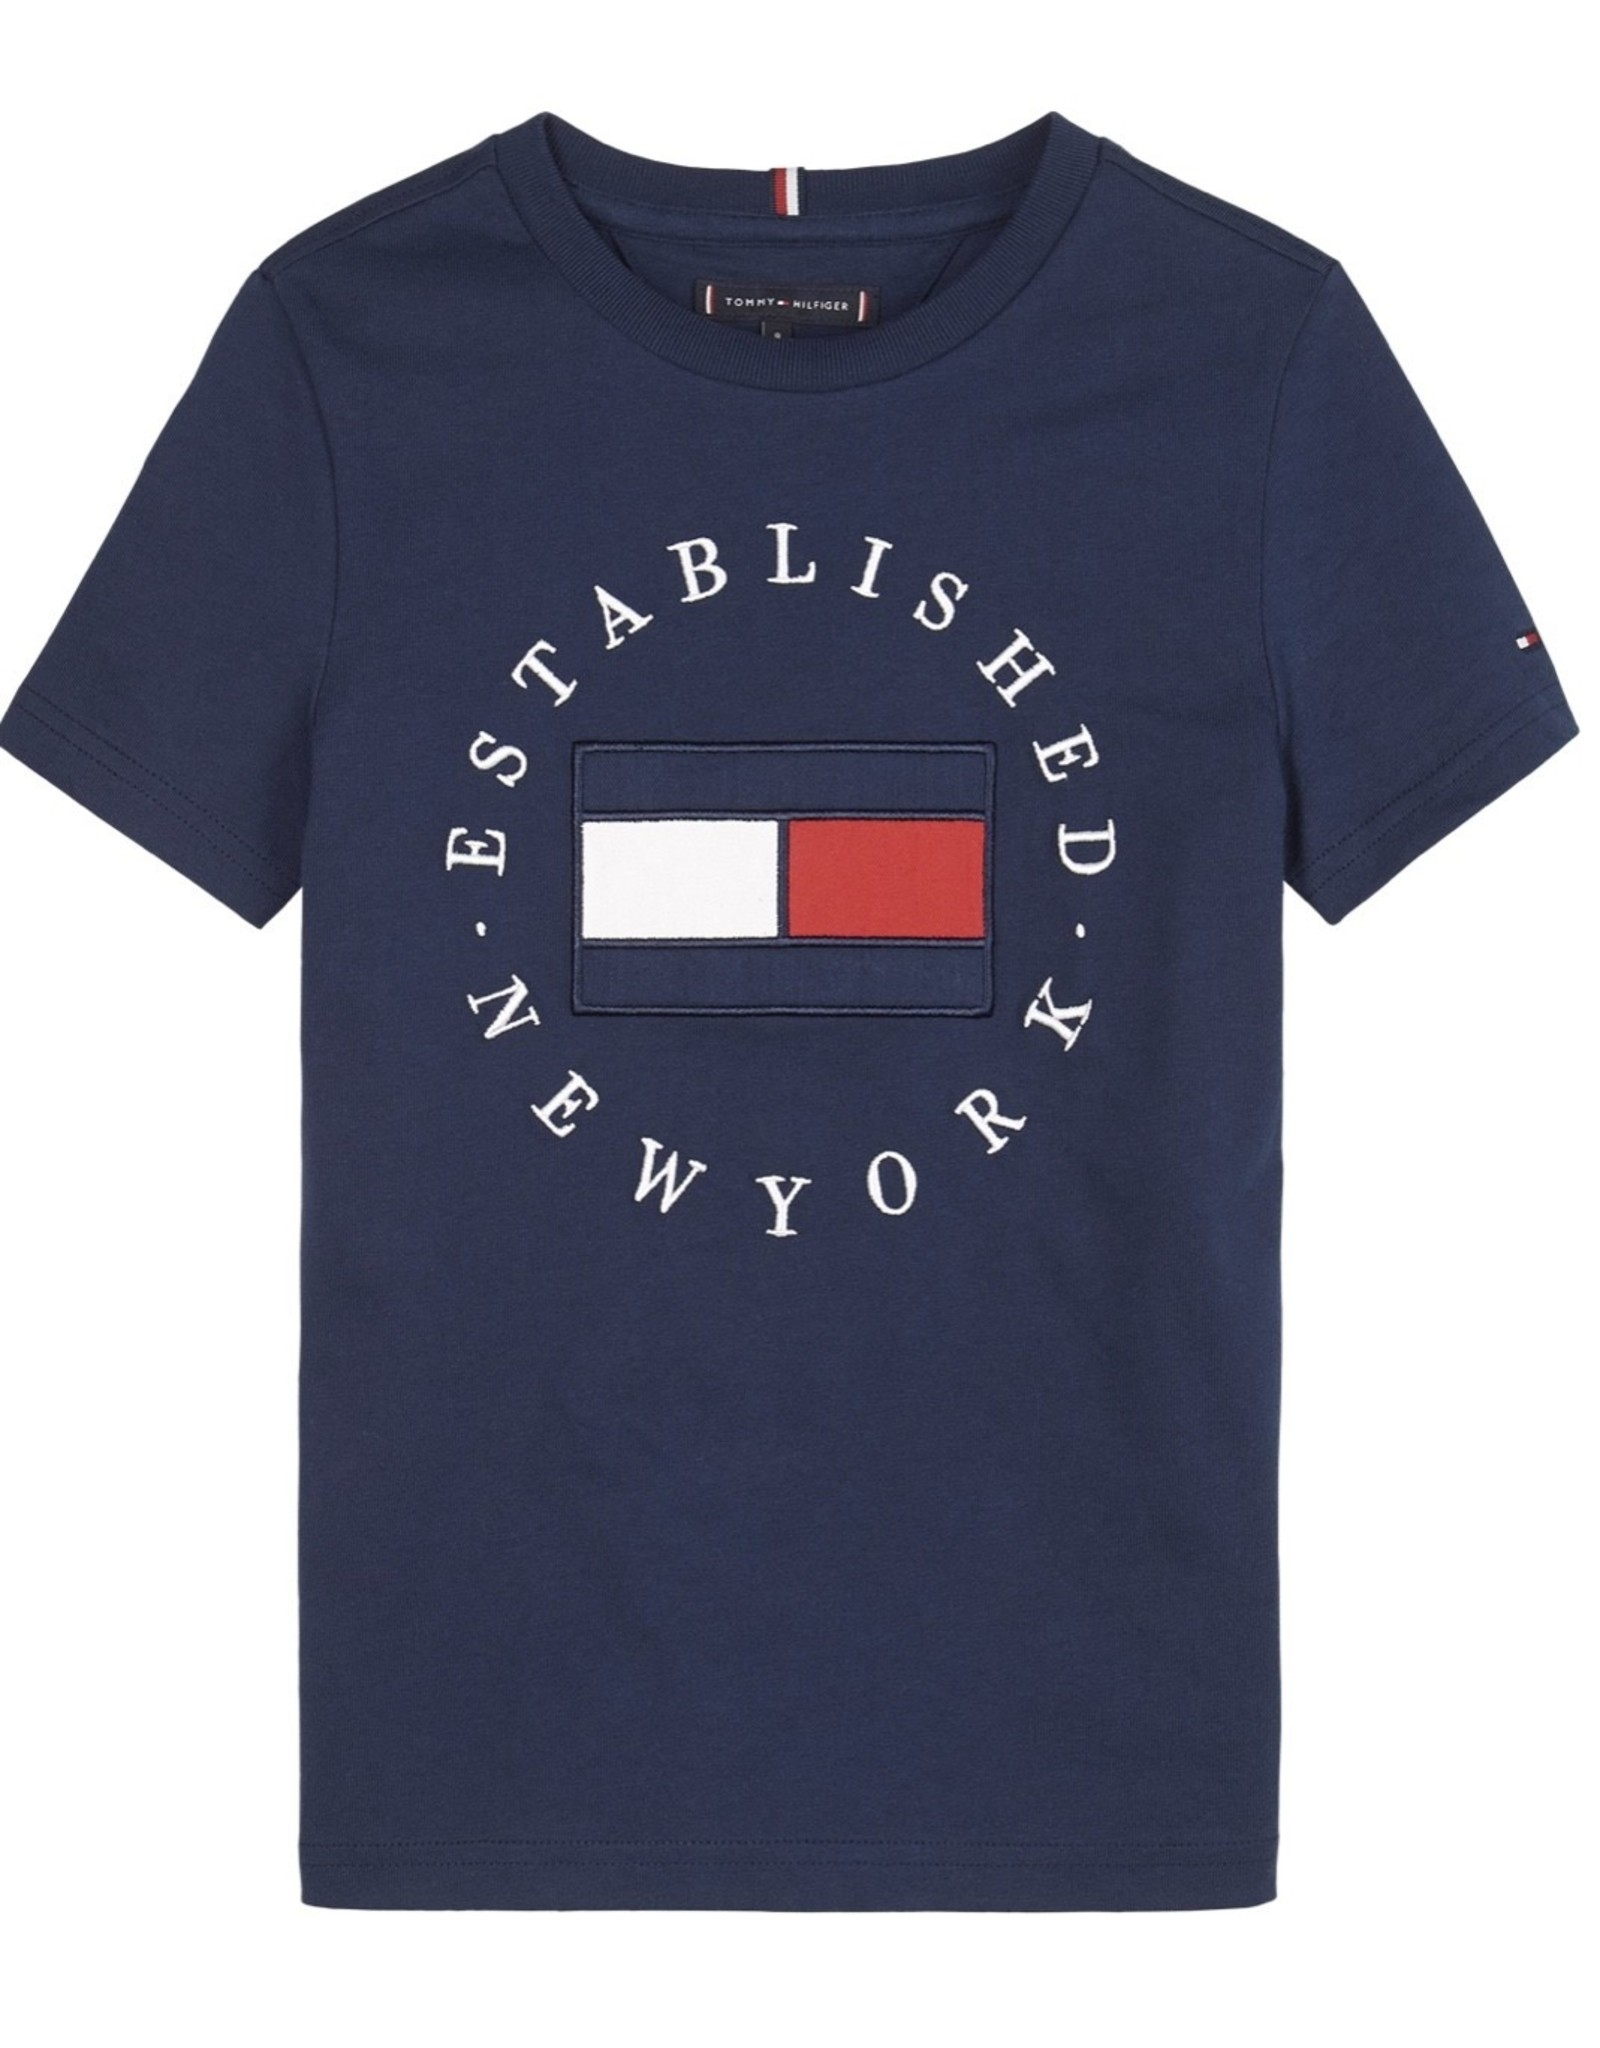 Tommy Hilfiger 5718 T-Shirt